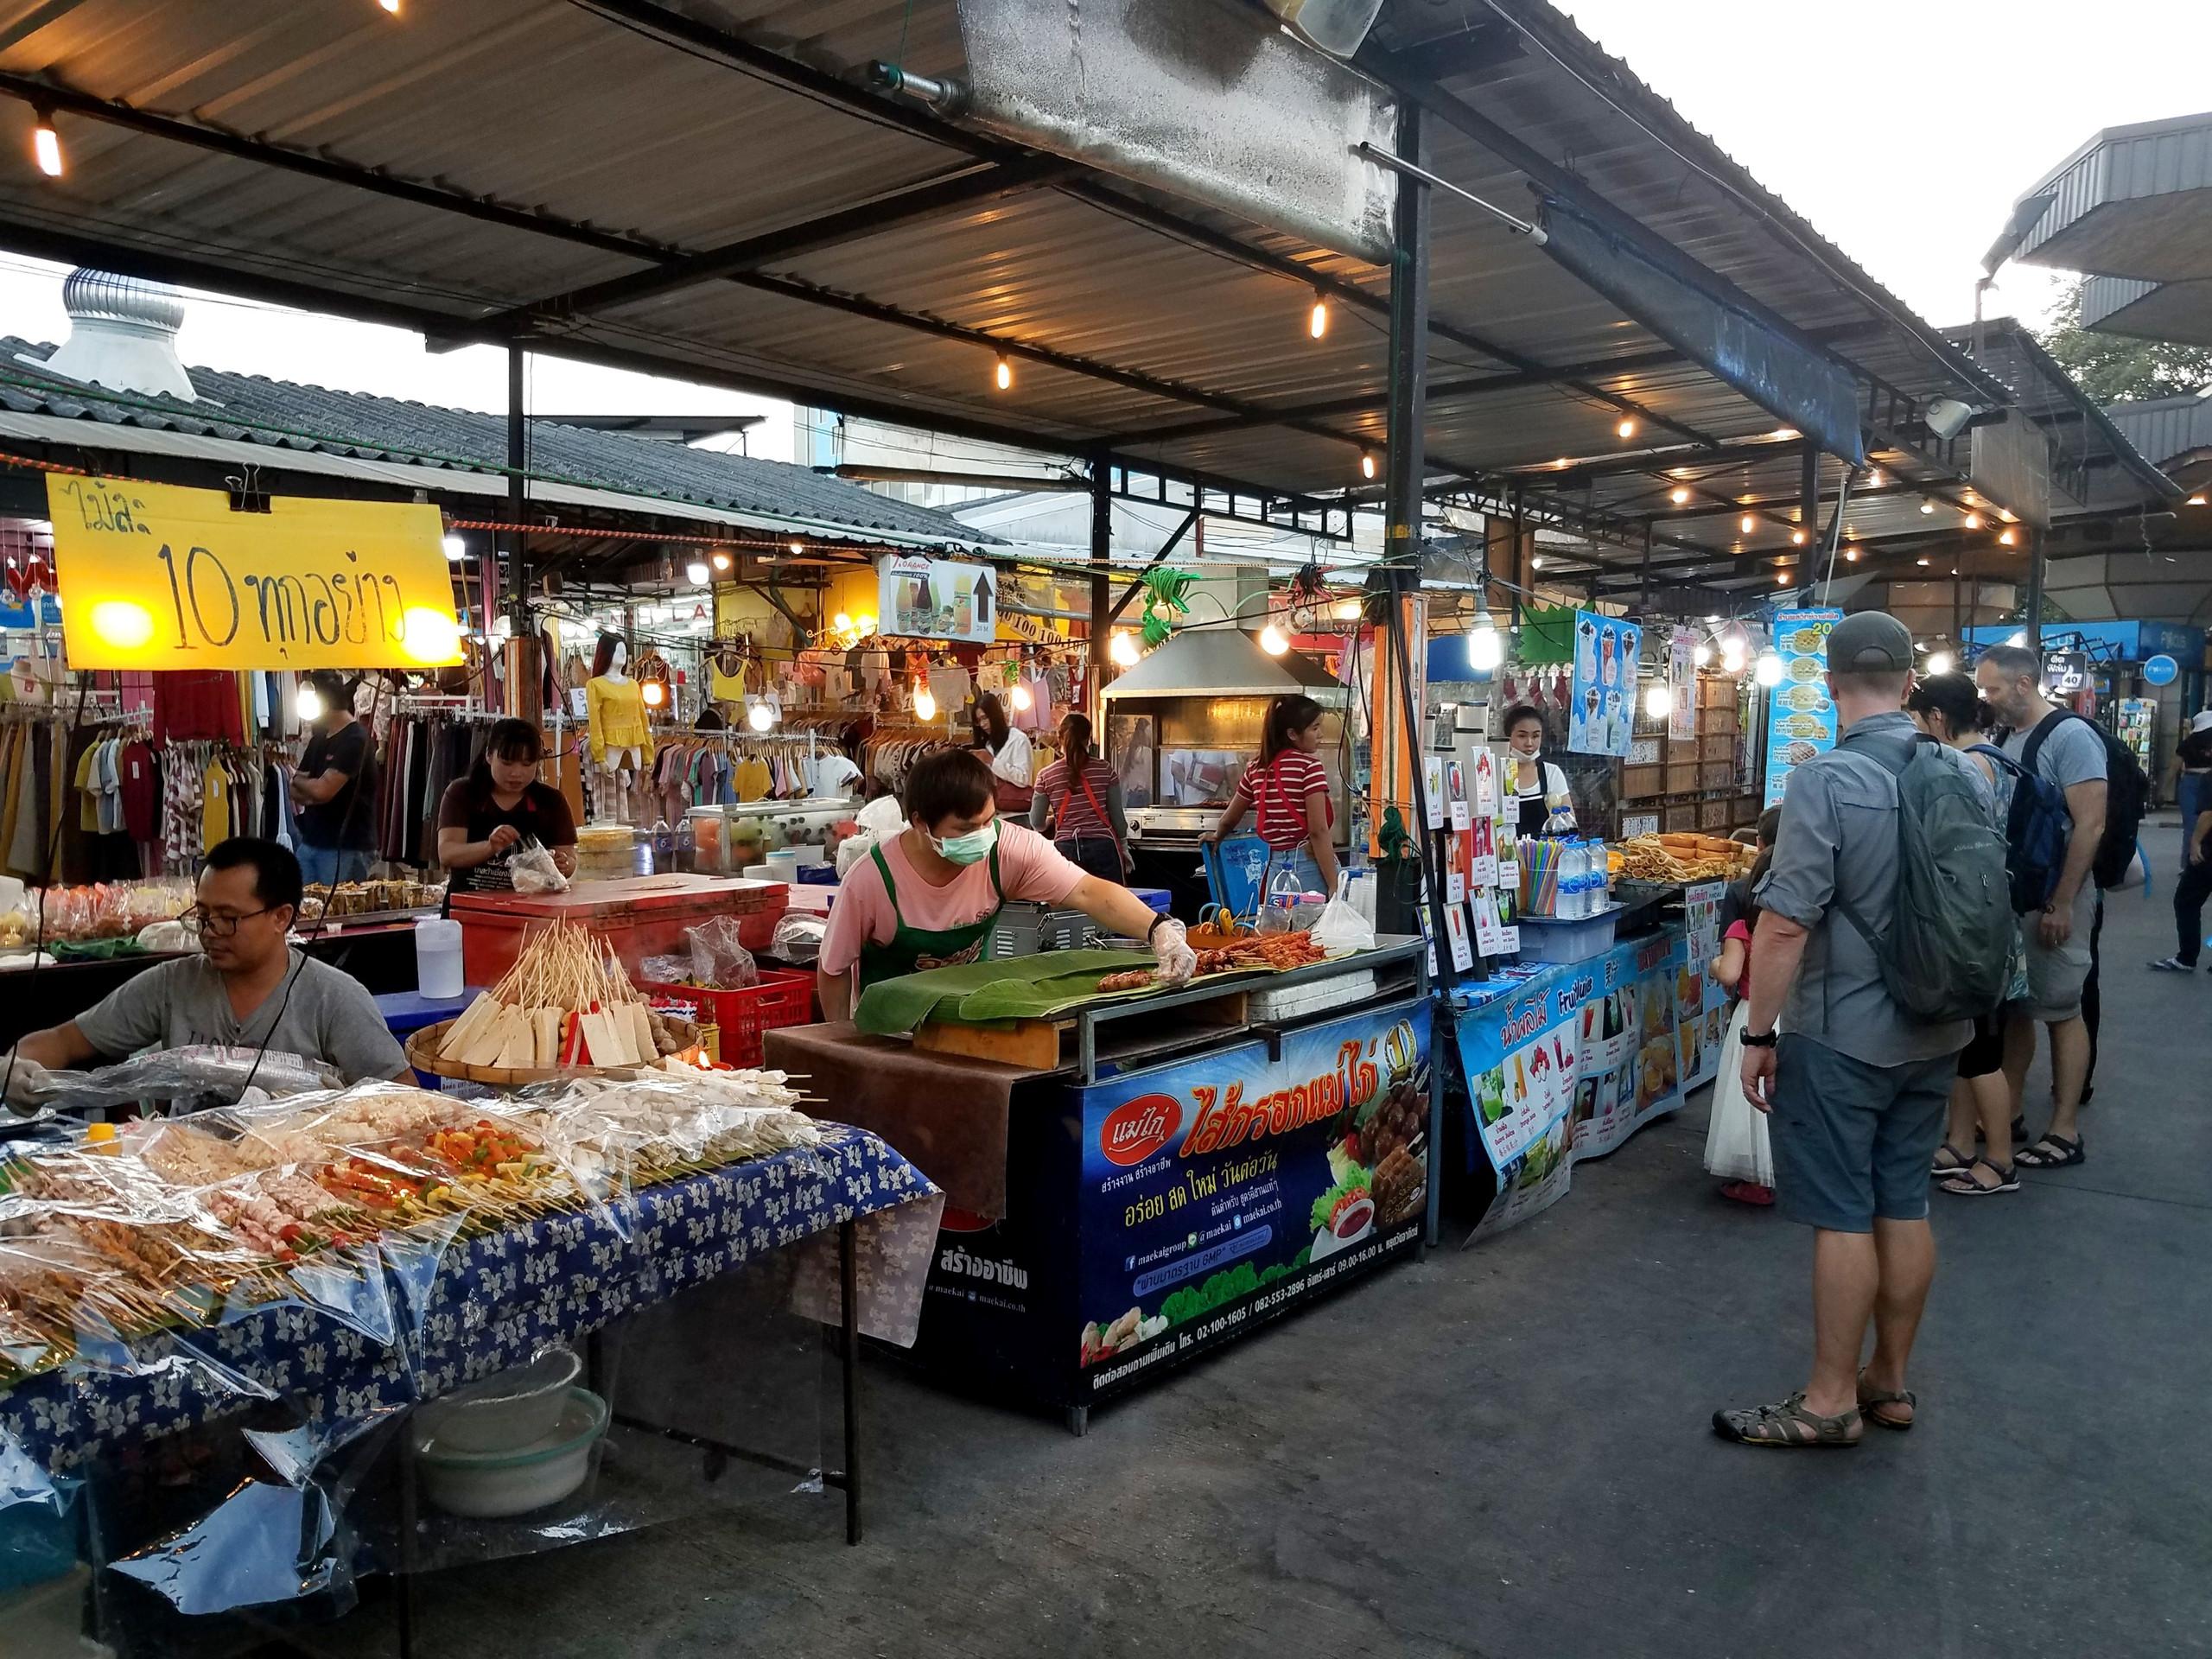 Night market scene in Chiang Mai